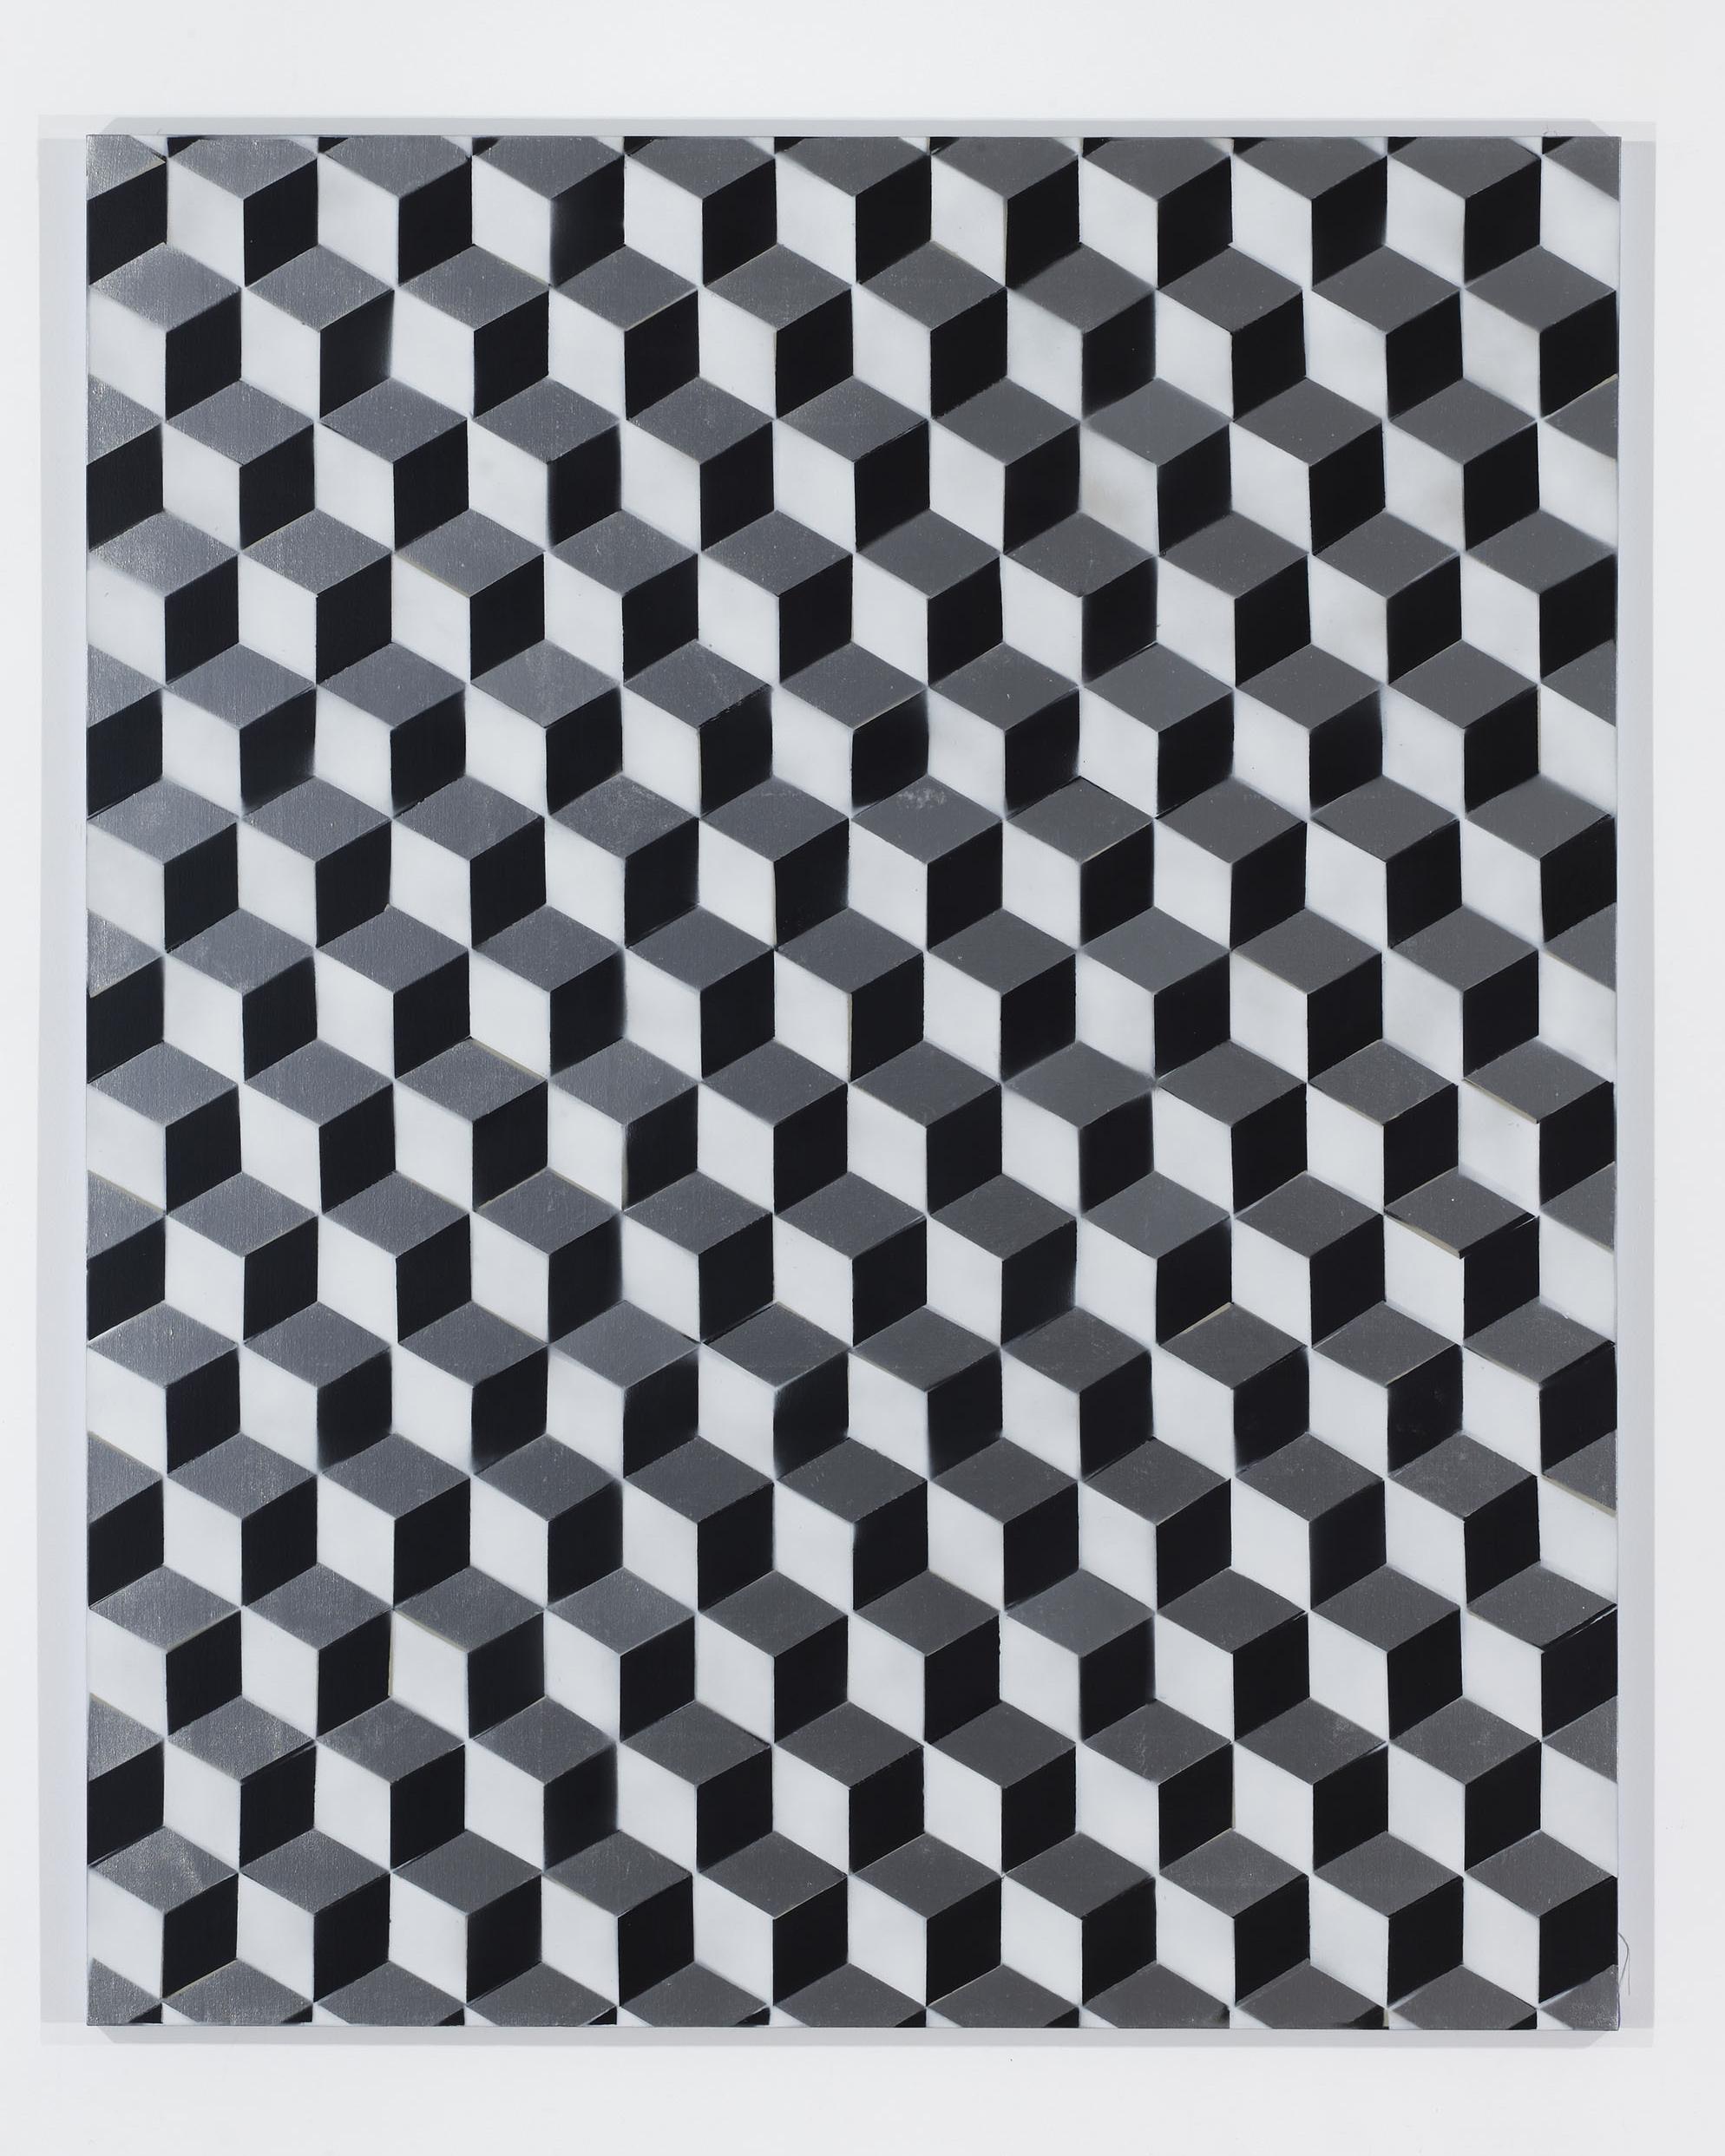 Rumspringa Quilt: Tumbling Blocks (Gray, Black and White)